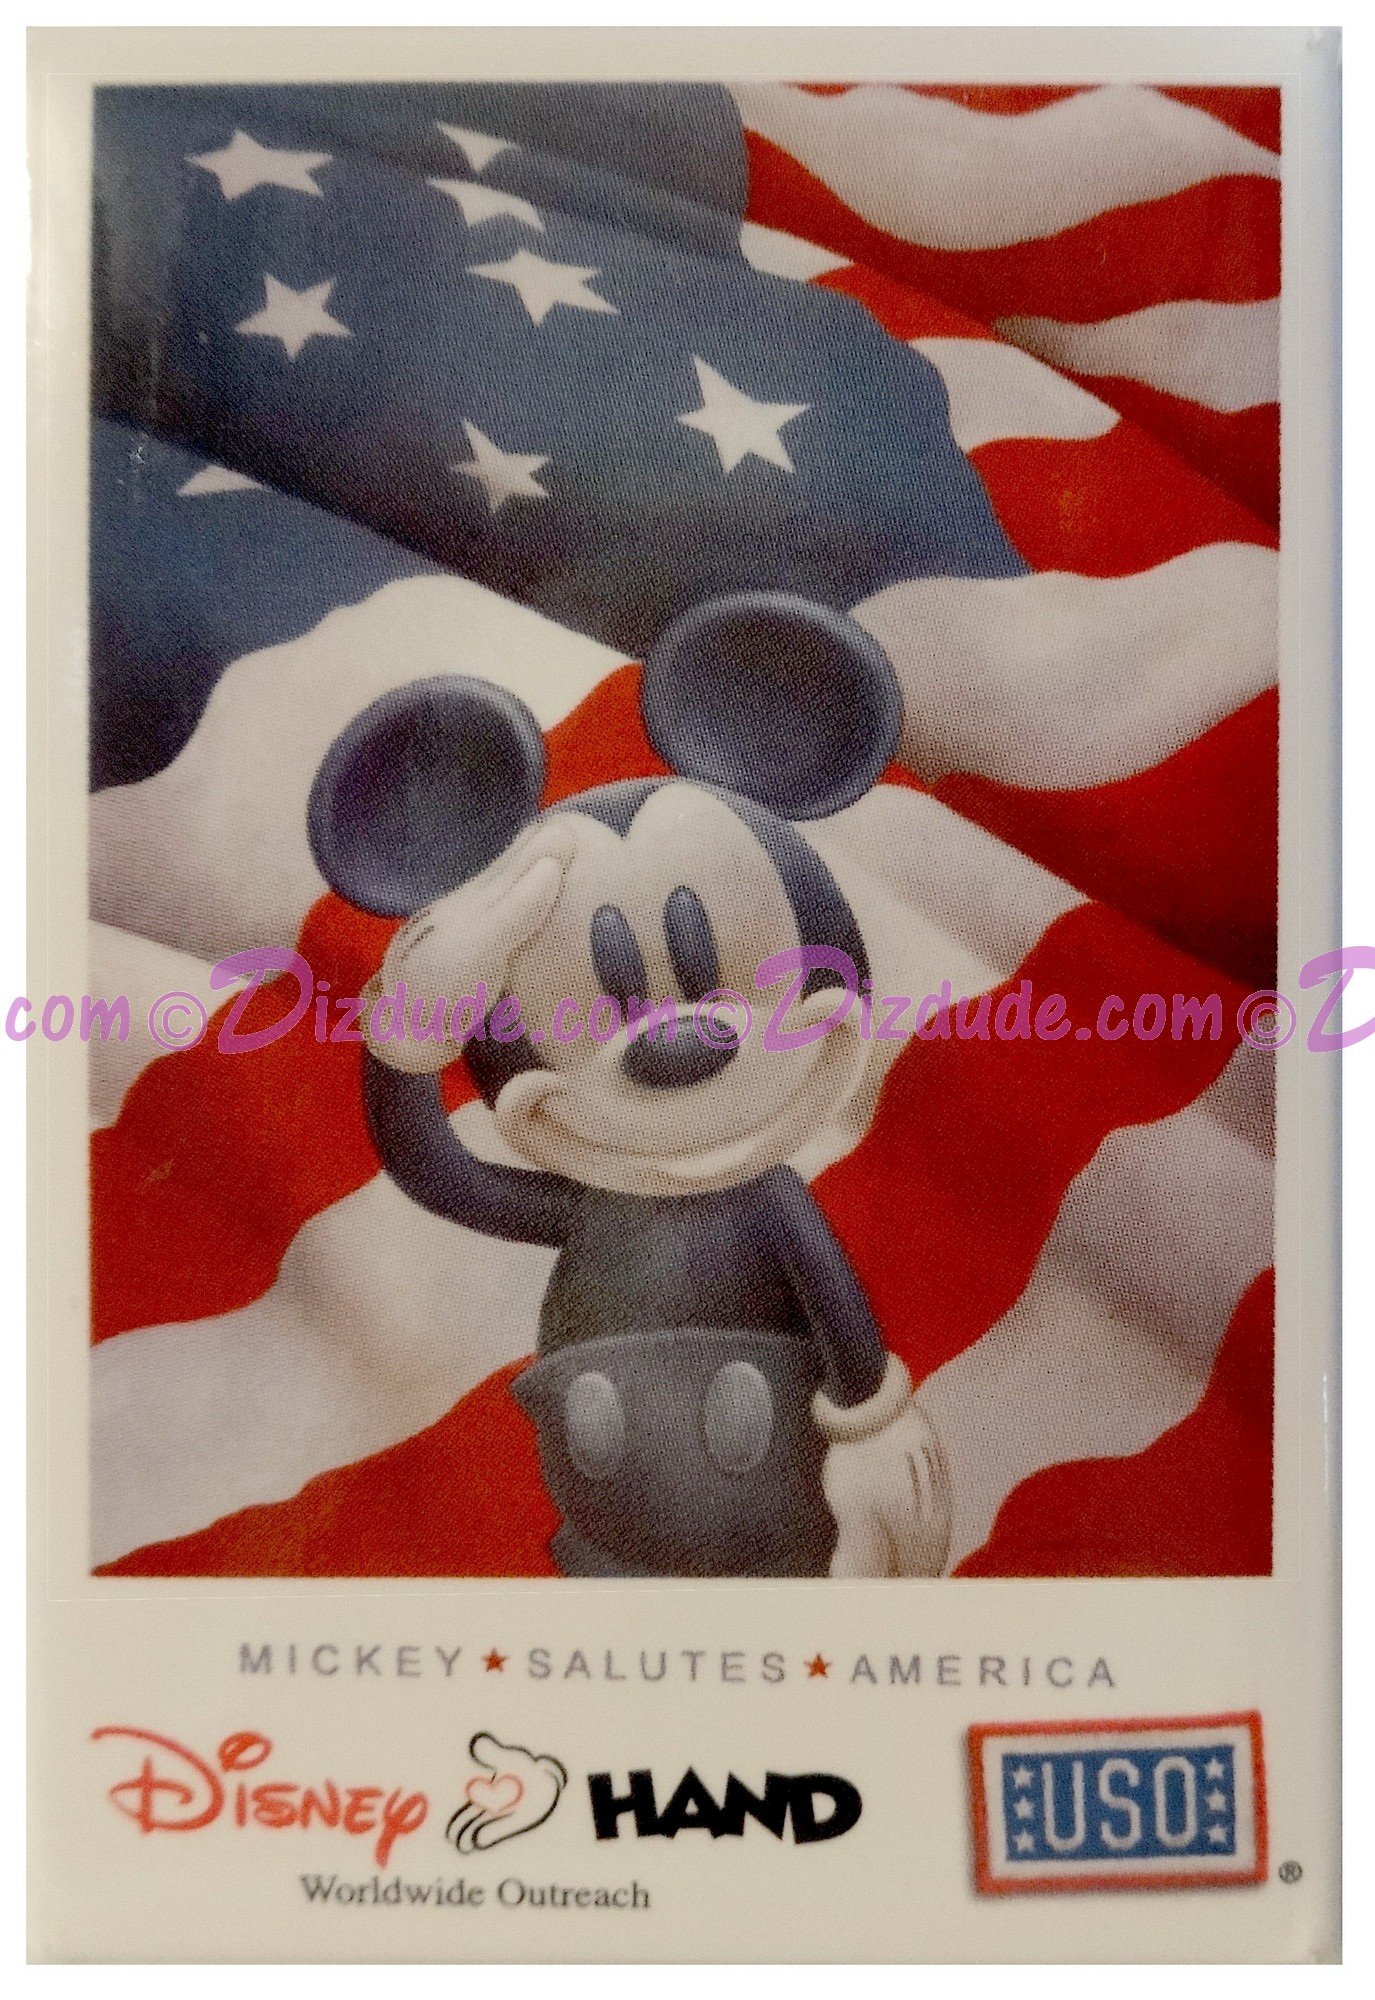 Walt Disney World Mickey Salutes America Button © Dizdude.com